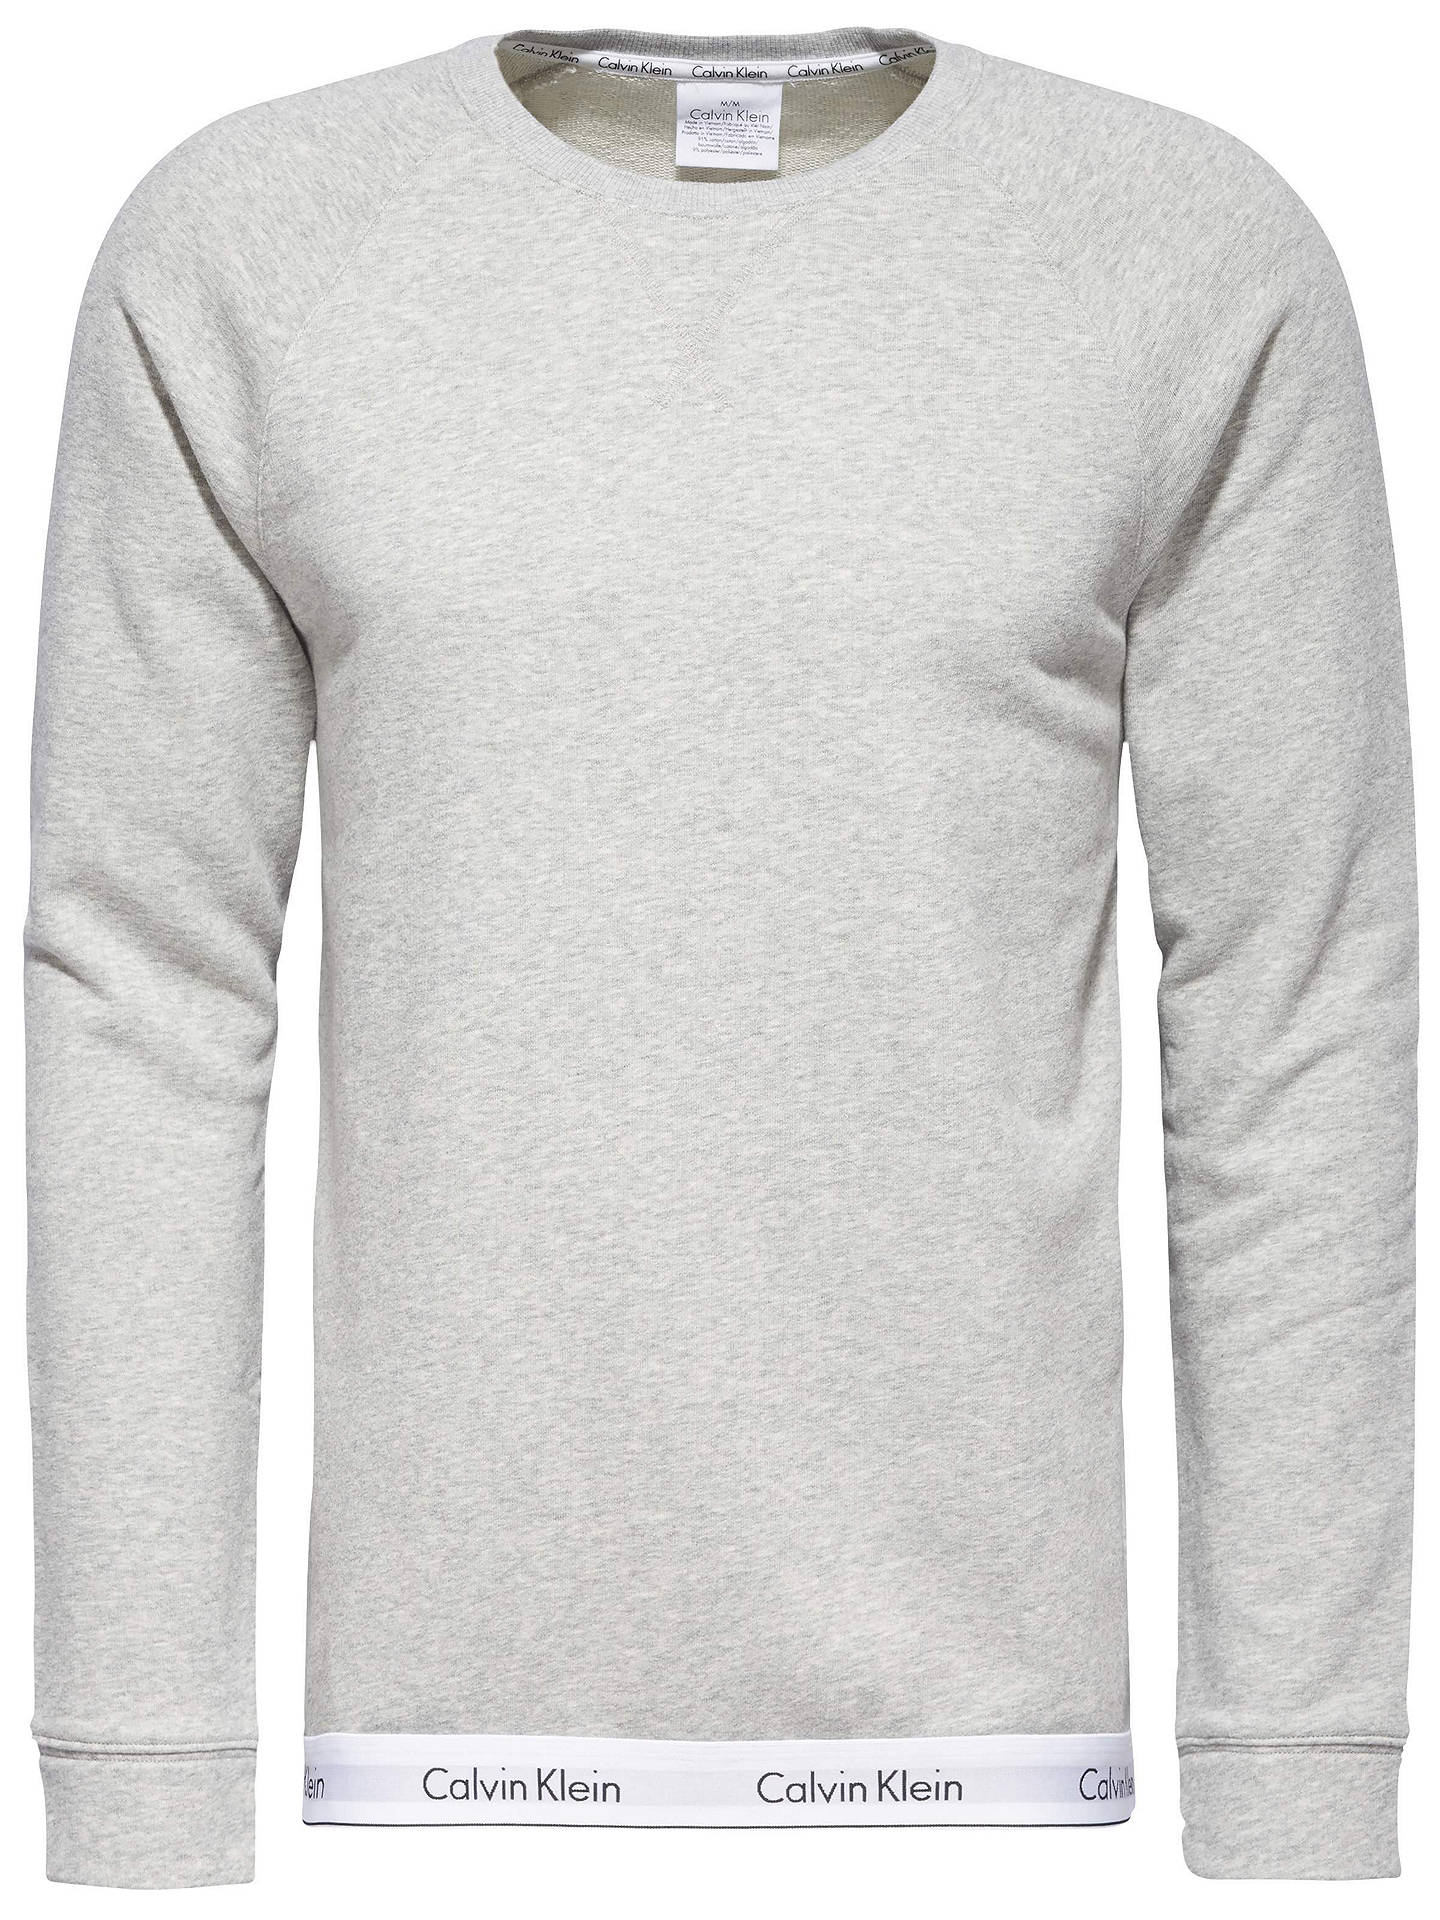 cec72042fe9 Buy Calvin Klein CK Modern Cotton Sweatshirt